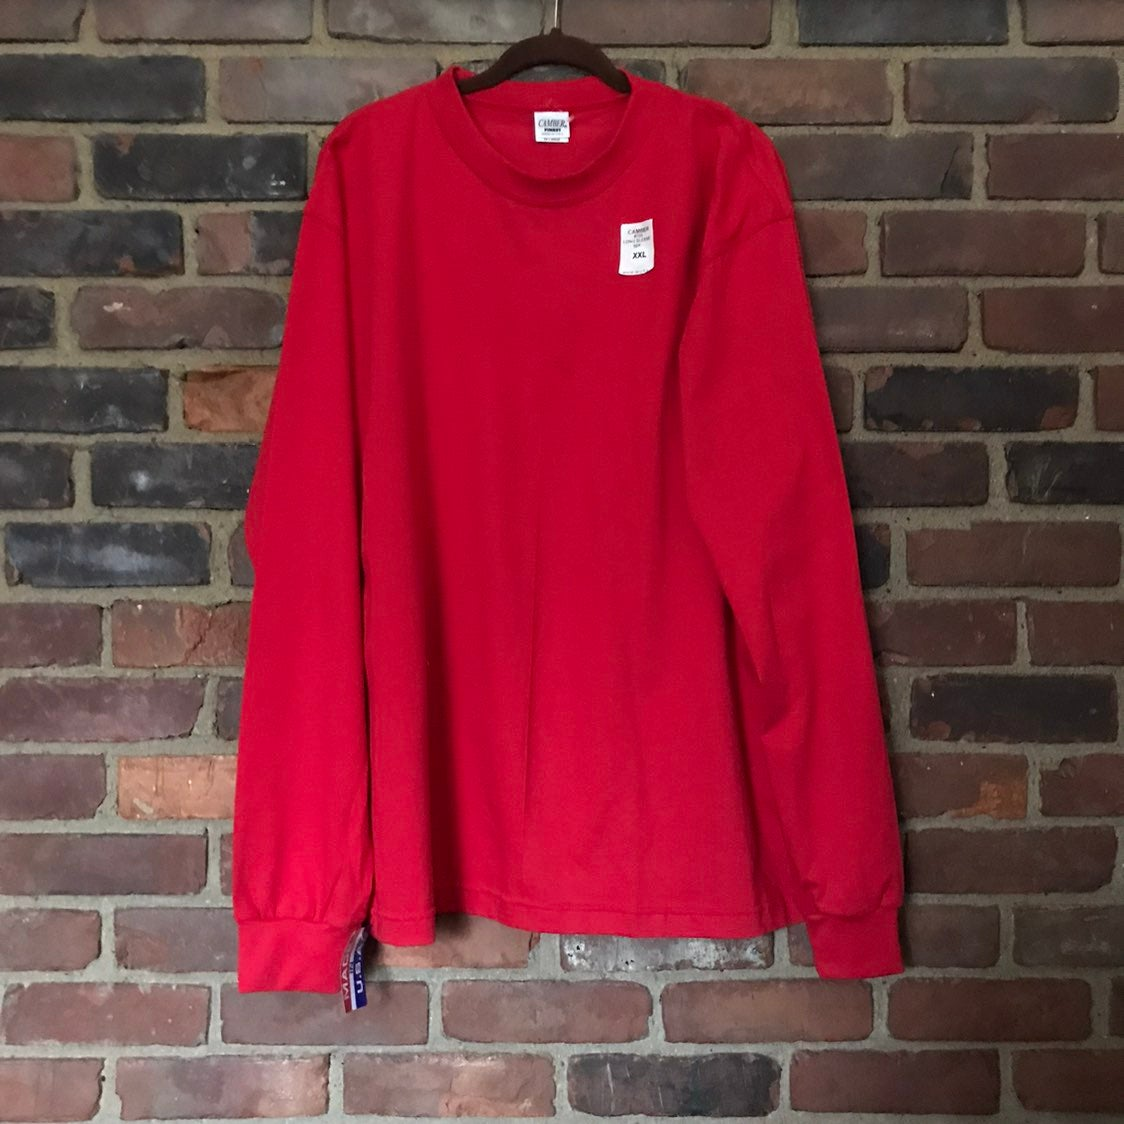 CAMBER jersey sweatshirt tee shirt 2X